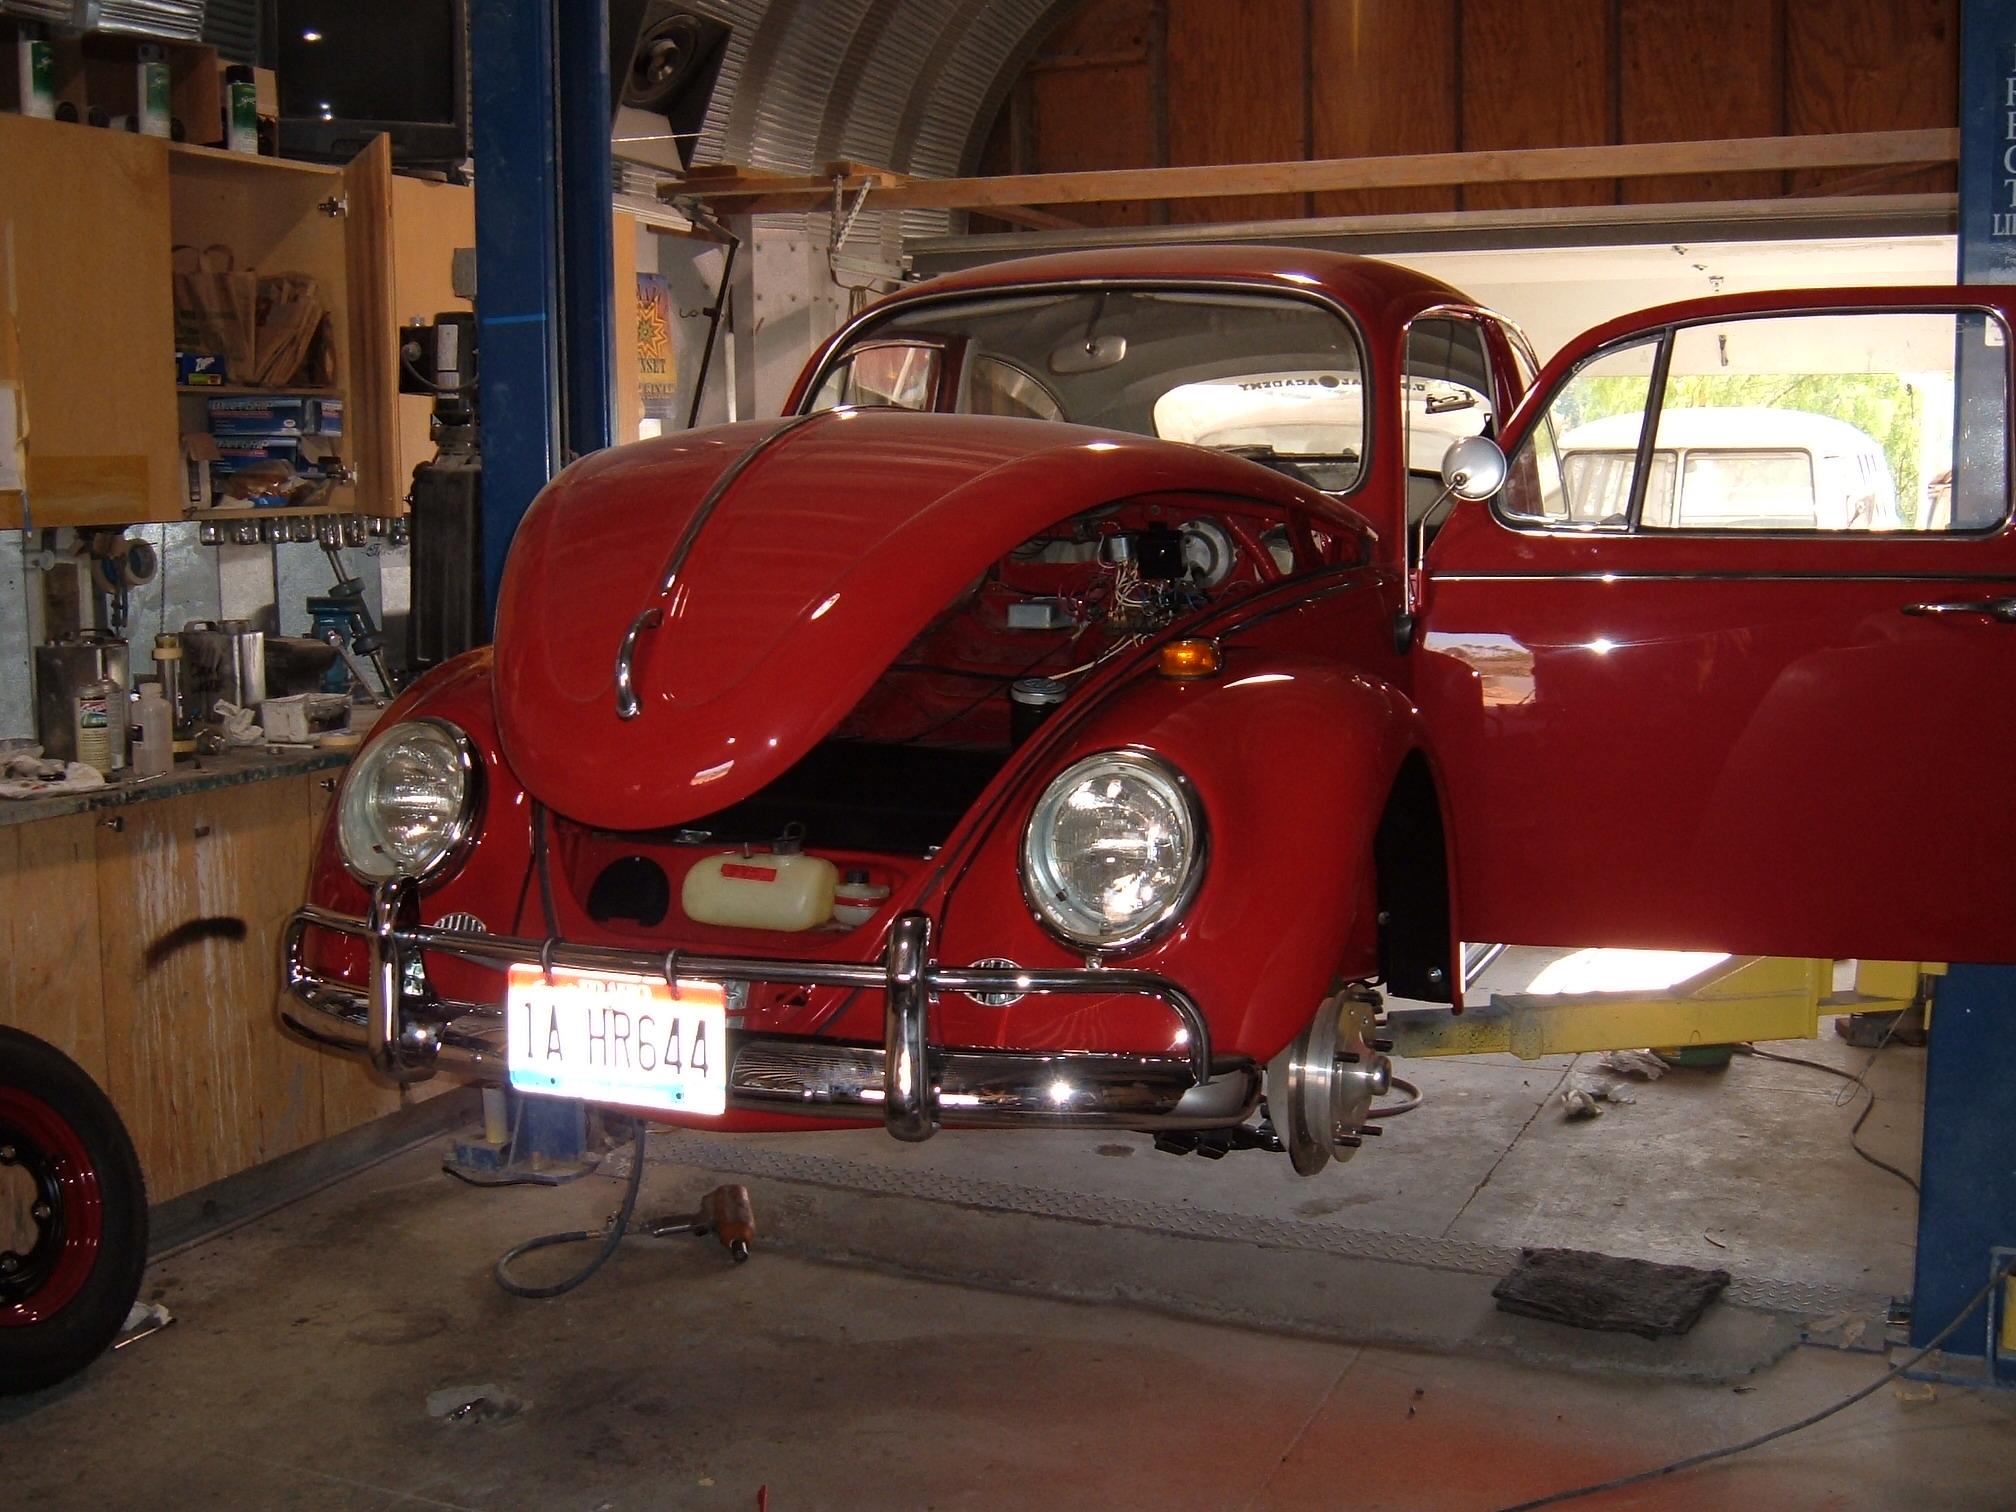 '66 VW Beetle: Front